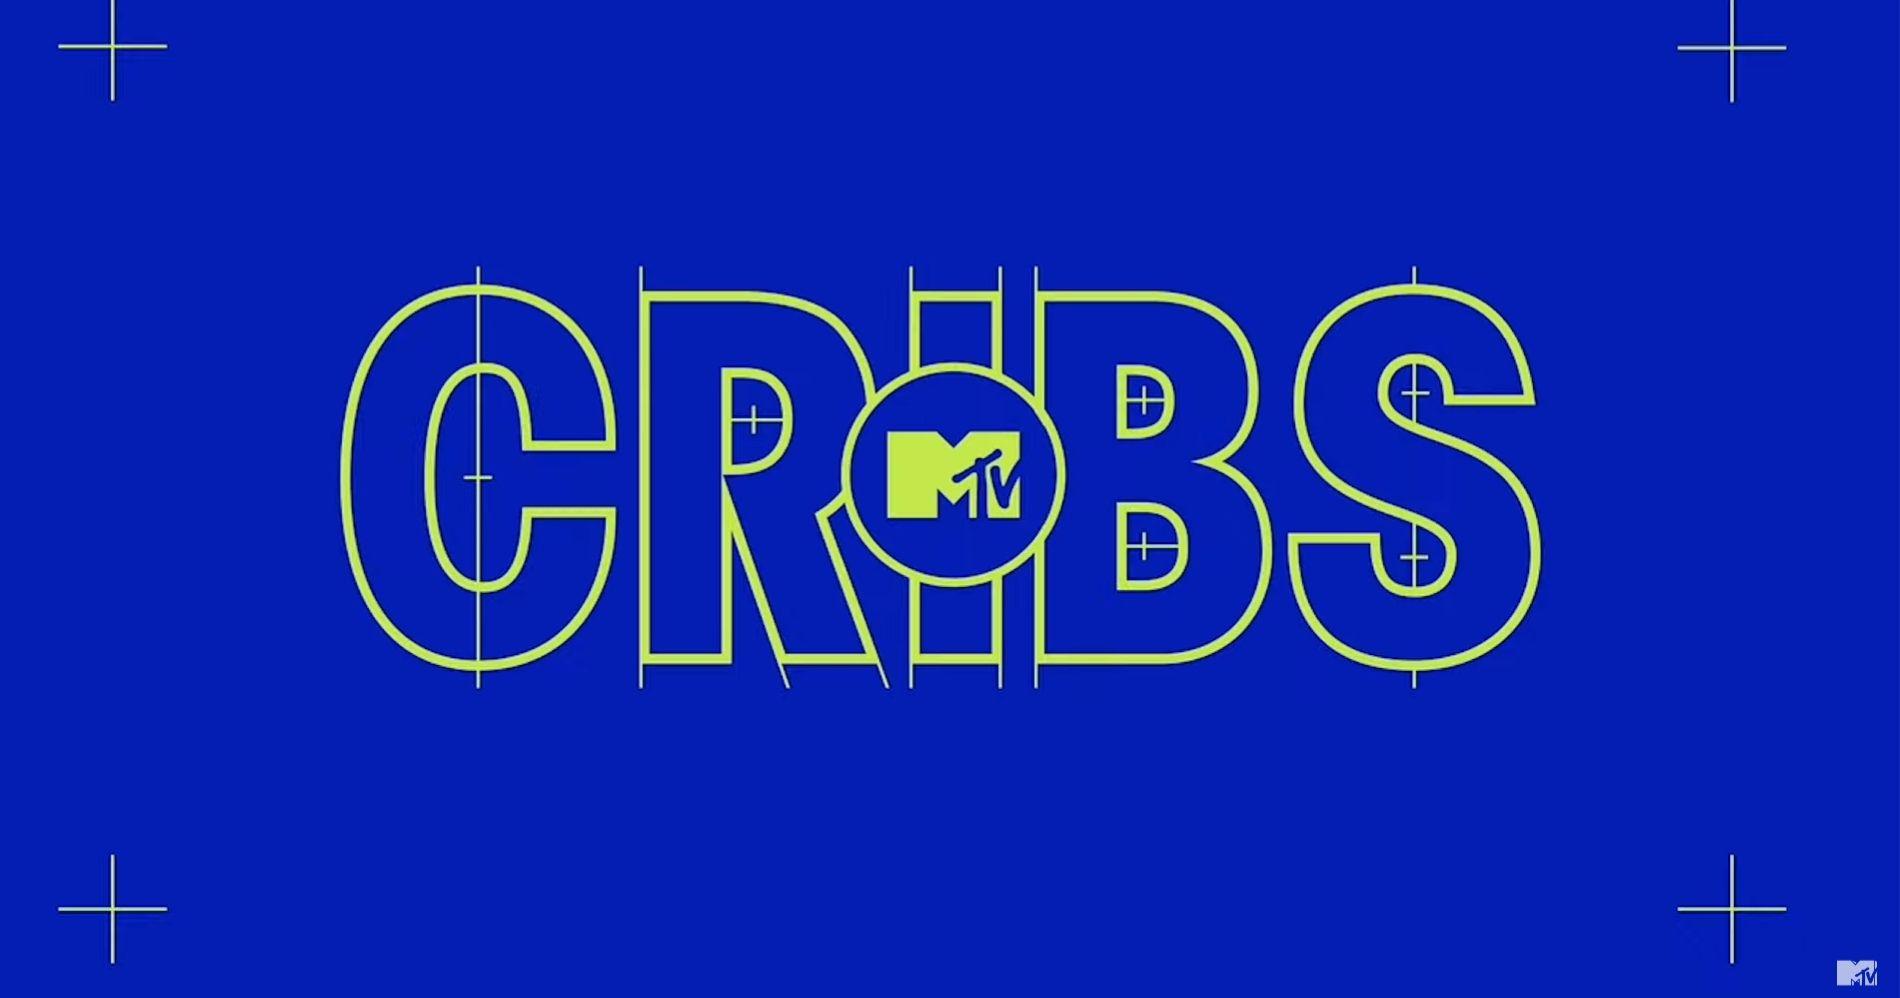 MTV Cribs Illustration Web Bisnis Muda - Image: Kanal Youtube MTV Vault